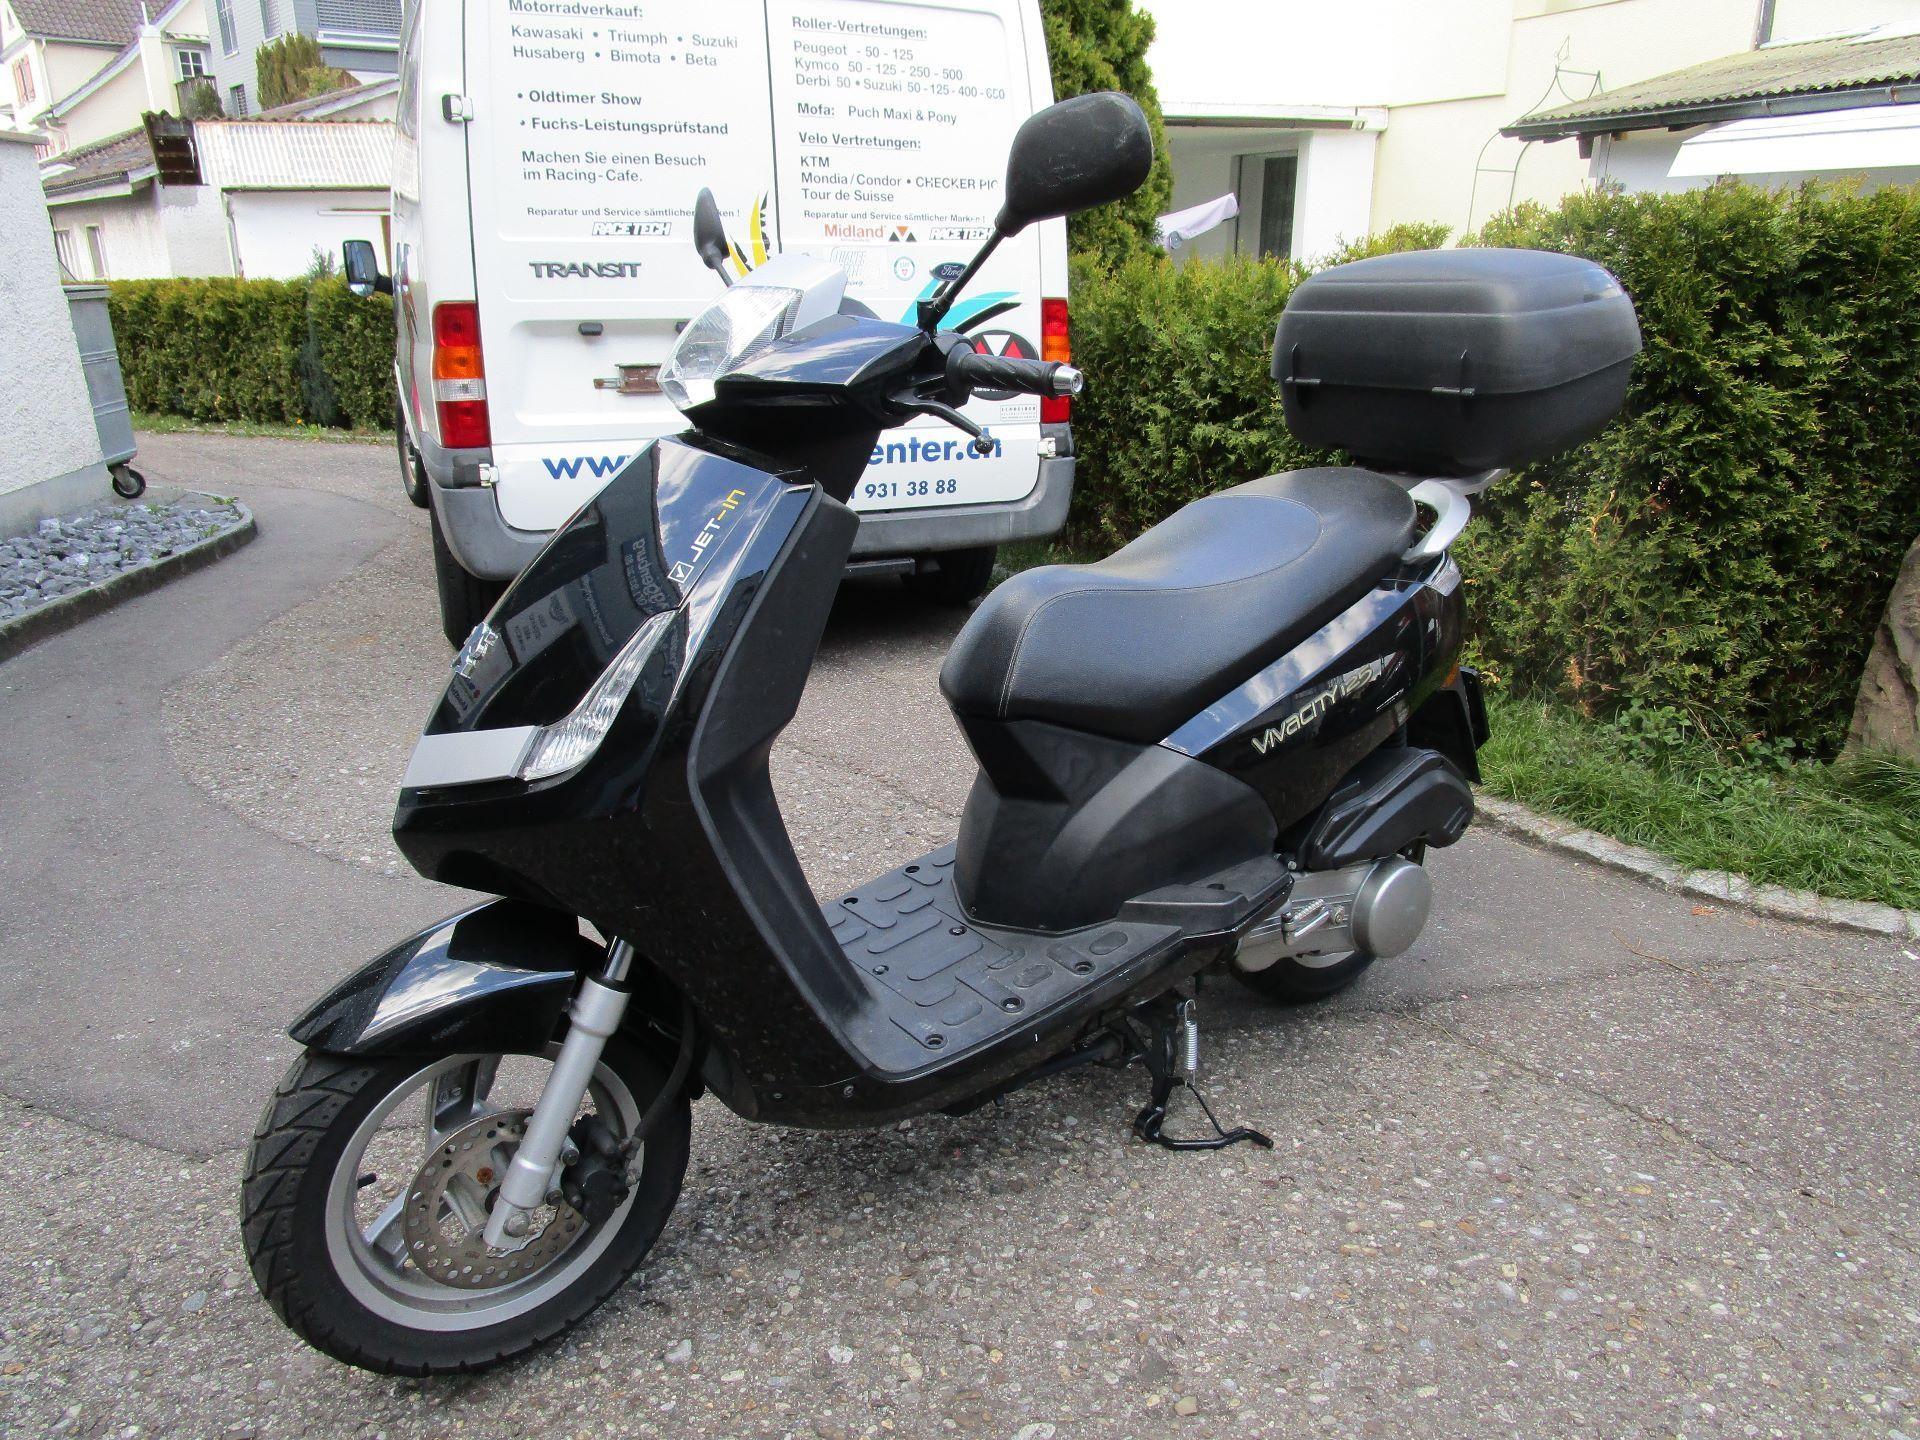 moto occasions acheter peugeot vivacity 125 zweiradcenter toggenburg l tisburg. Black Bedroom Furniture Sets. Home Design Ideas